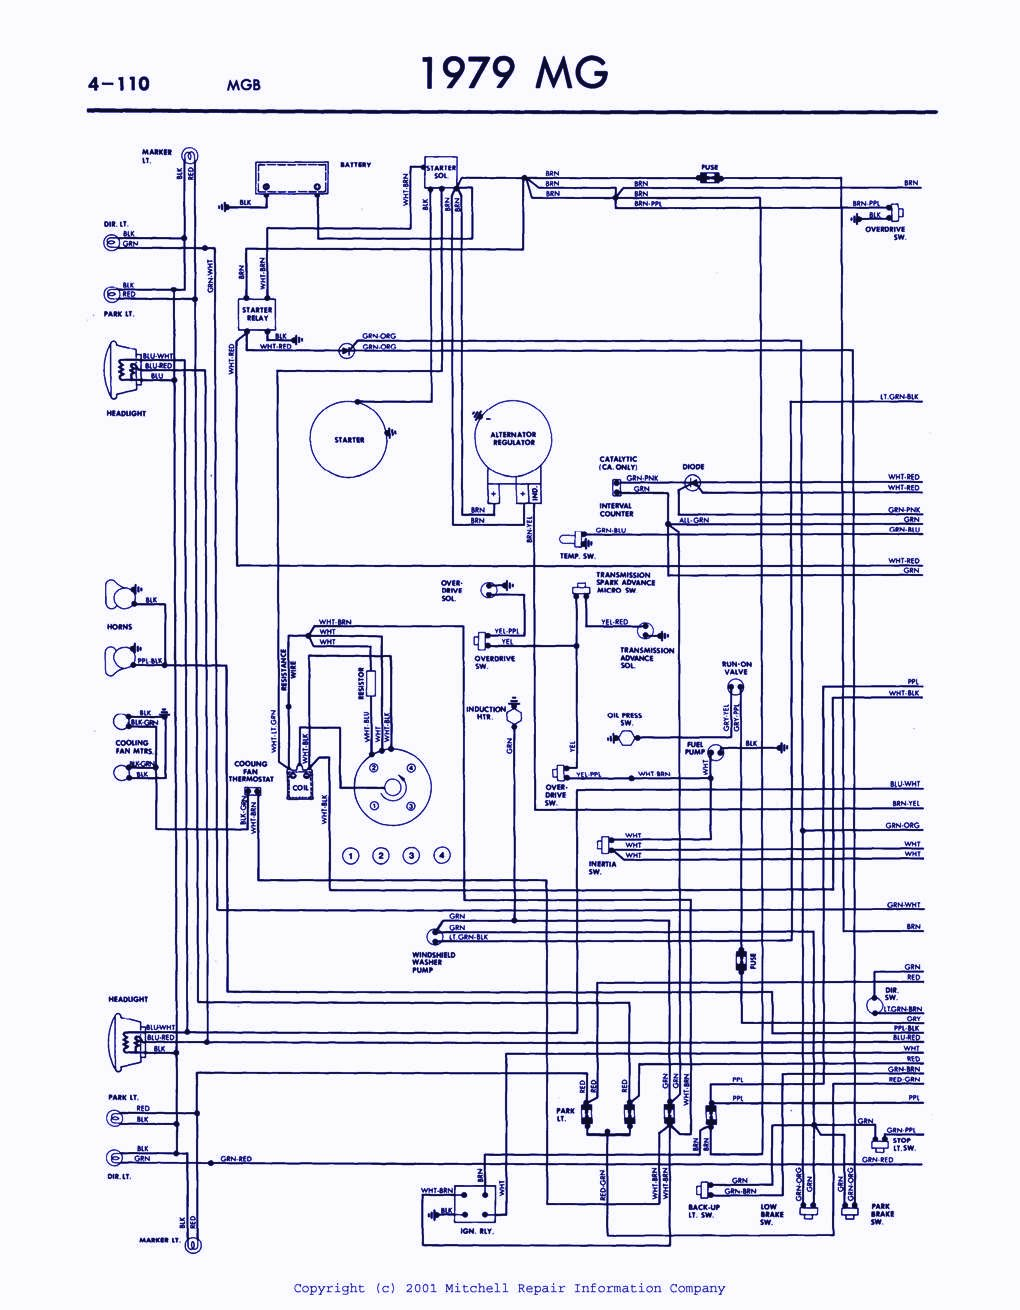 medium resolution of 1976 mgb engine diagram wiring diagram yer mgb engine parts diagram 1976 mgb engine diagram wiring